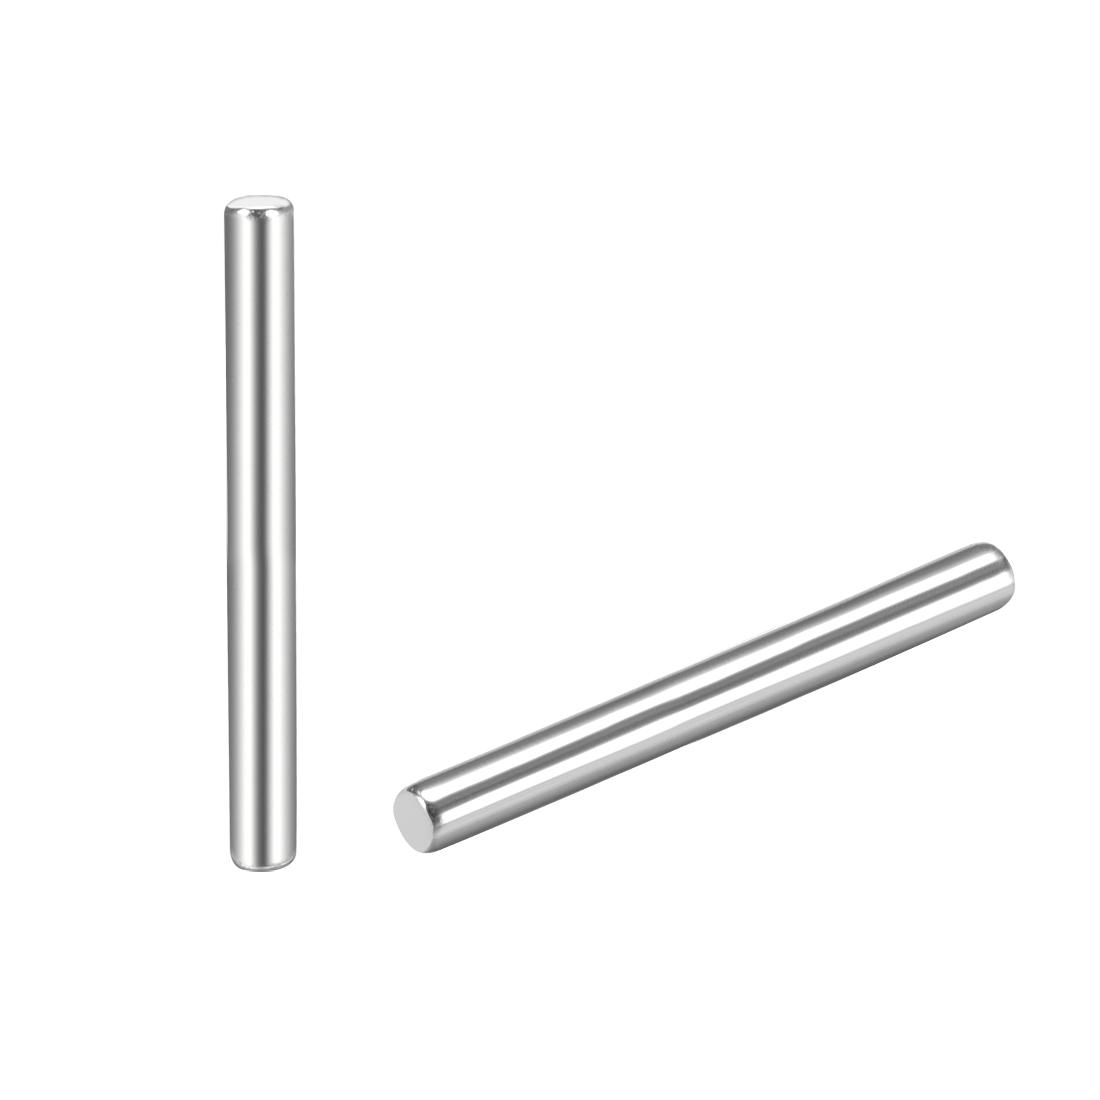 15Pcs 1.5mm x 20mm Dowel Pin 304 Stainless Steel Shelf Support Pin Fasten